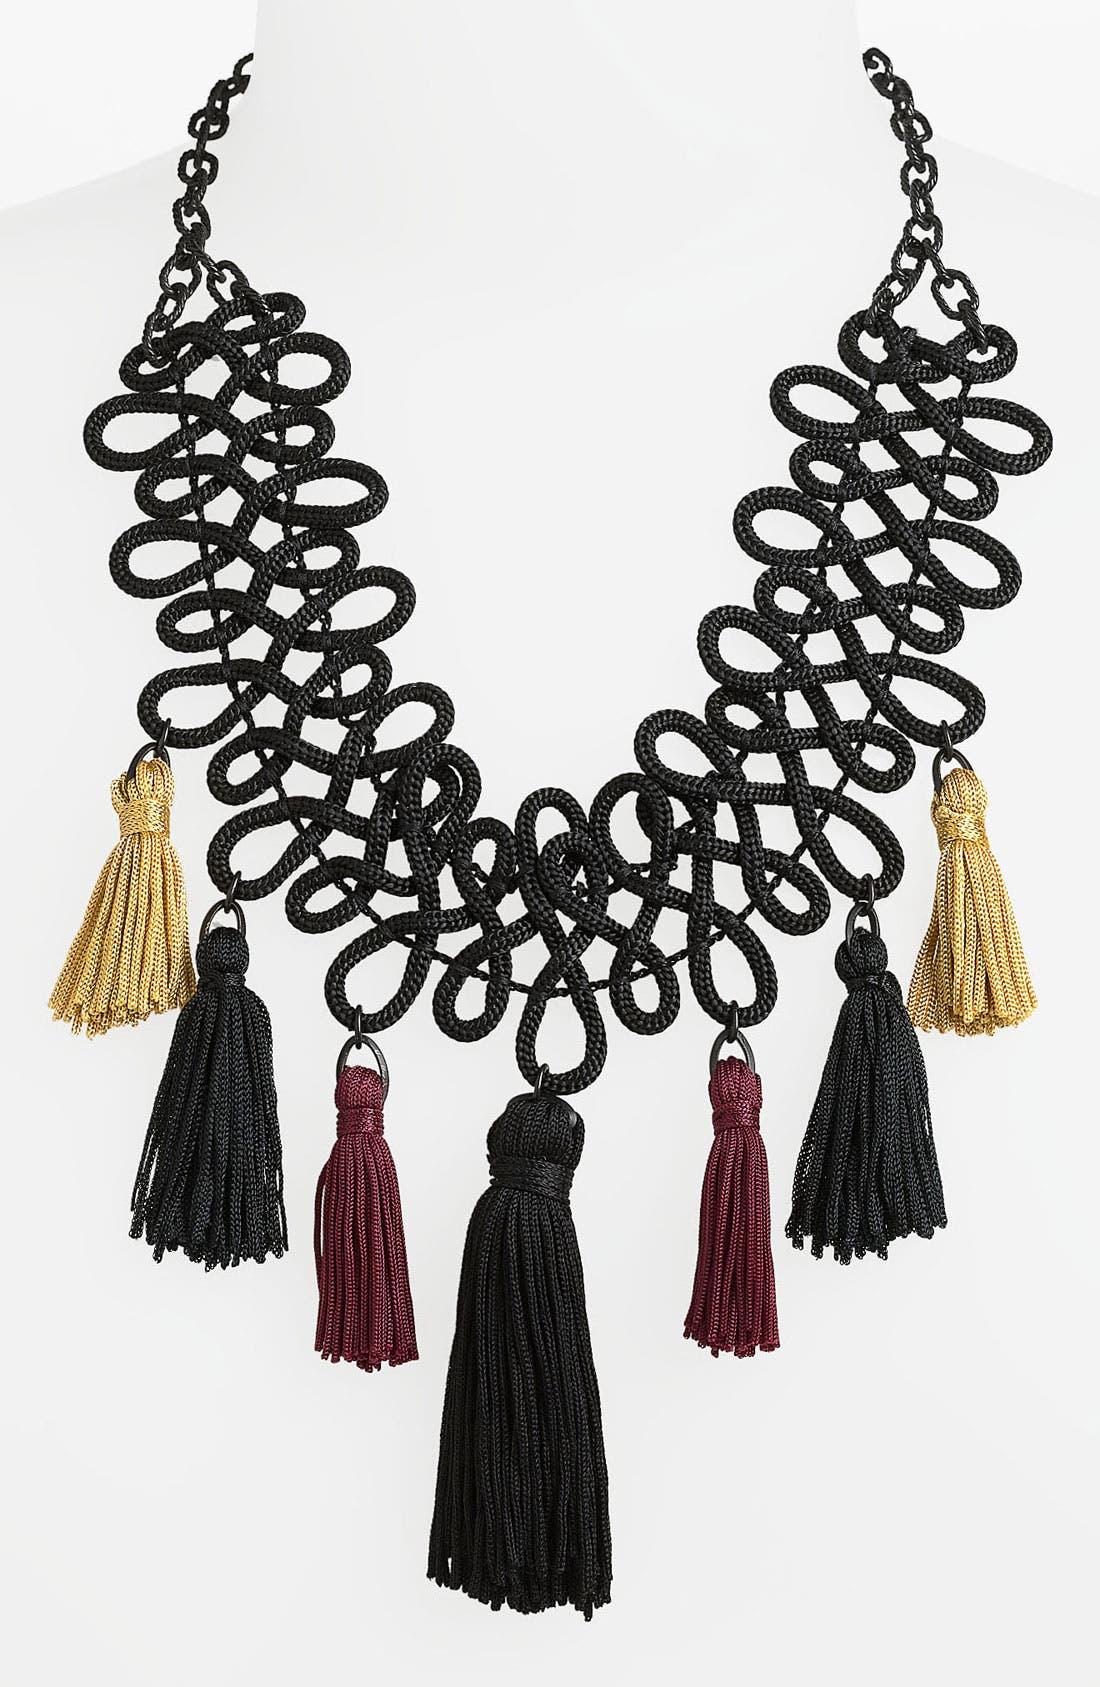 Alternate Image 1 Selected - Bonnie Jonas Tassel Necklace